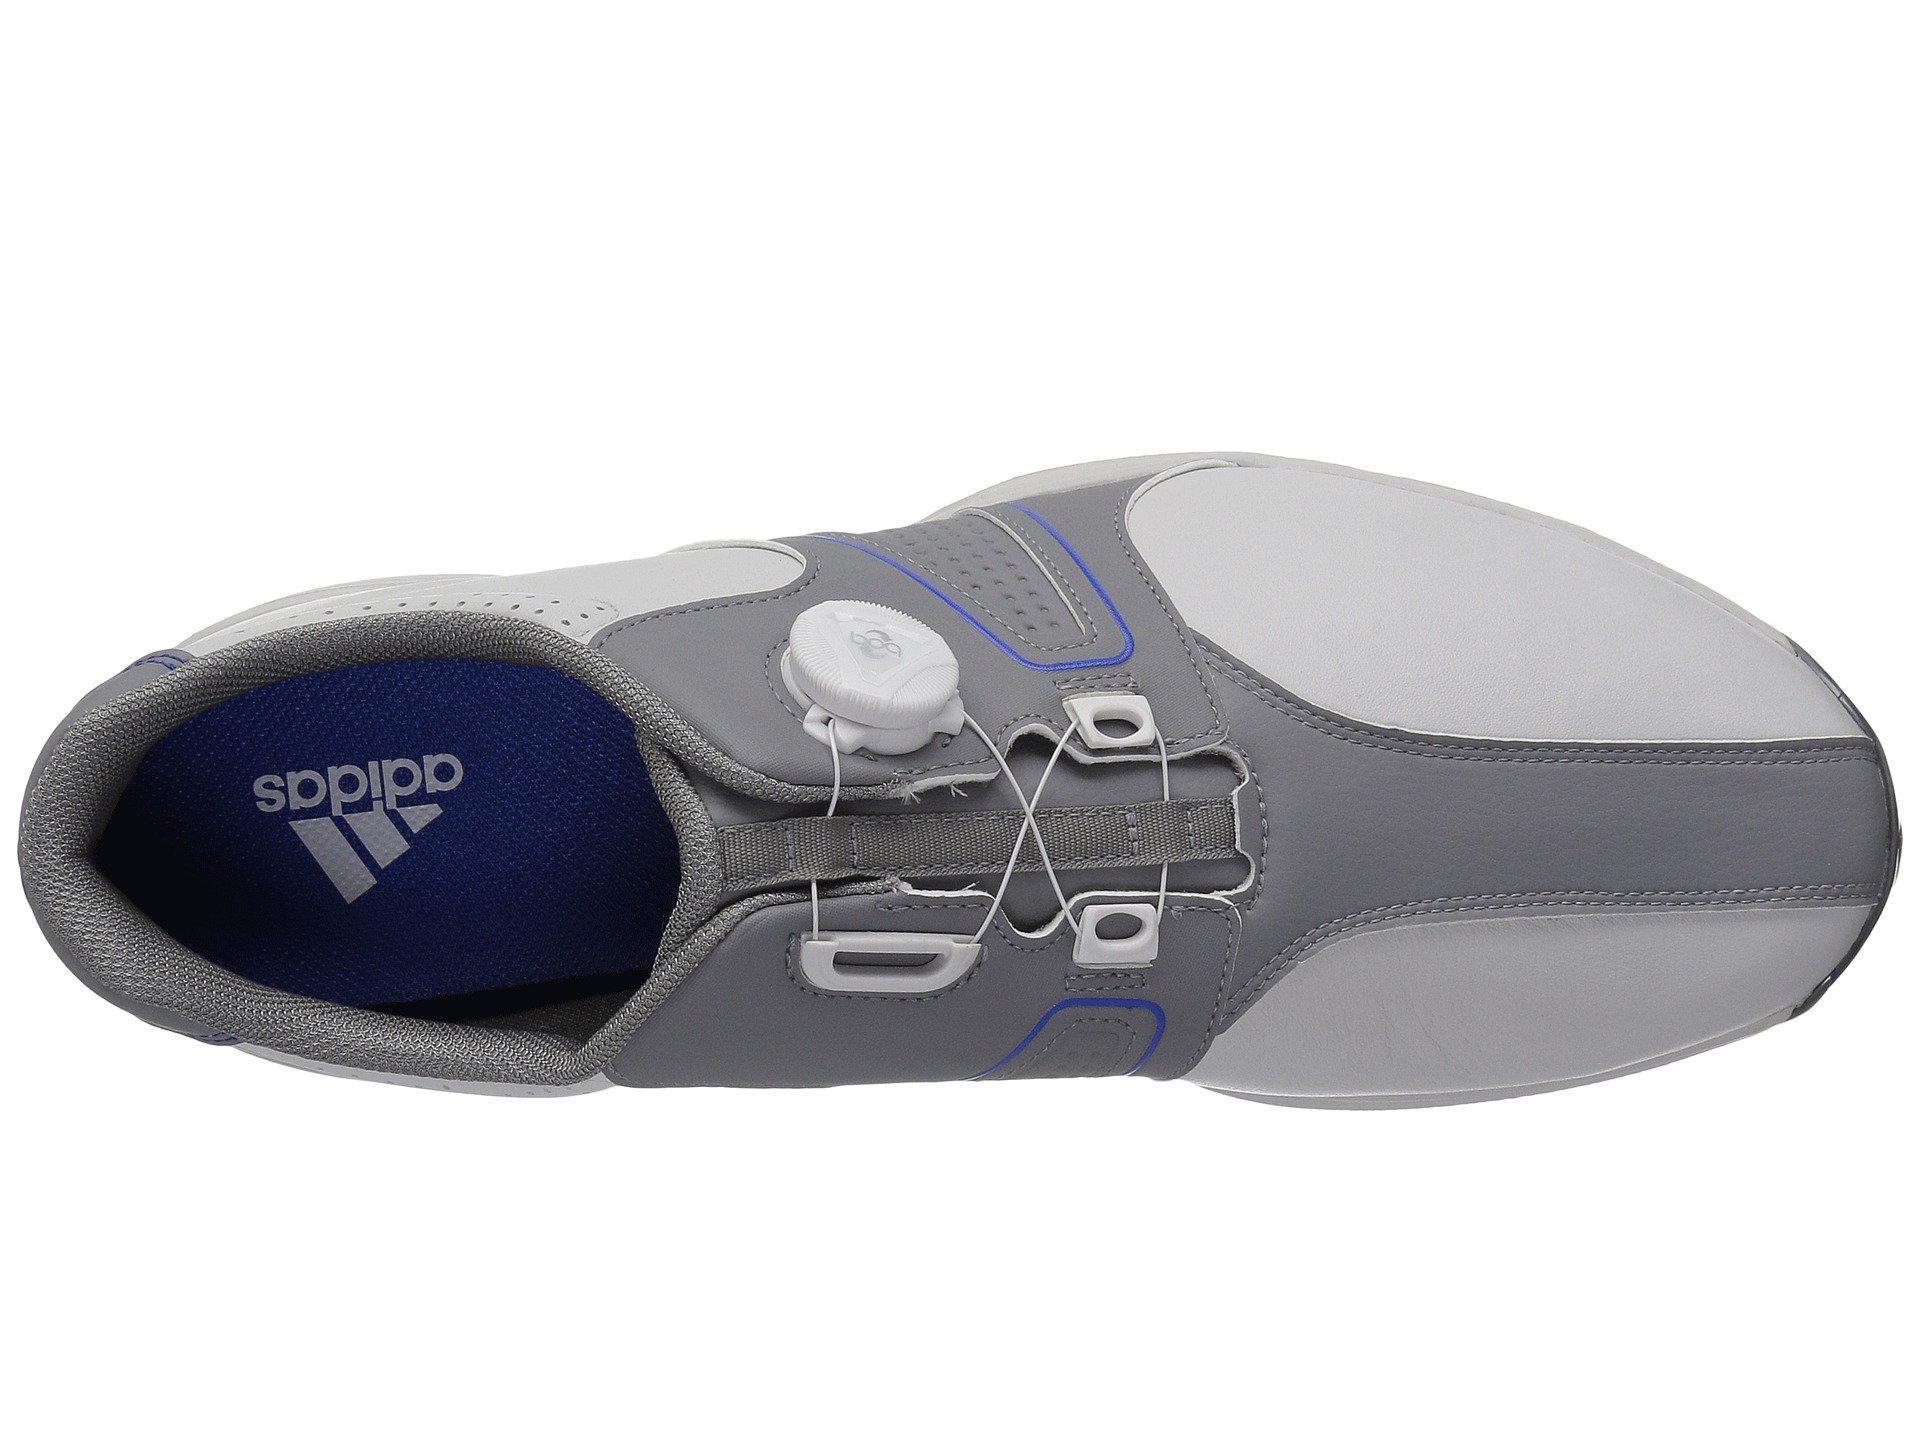 new style 0f786 0d0e6 Lyst - Adidas Originals 360 Traxion Boa in Gray for Men